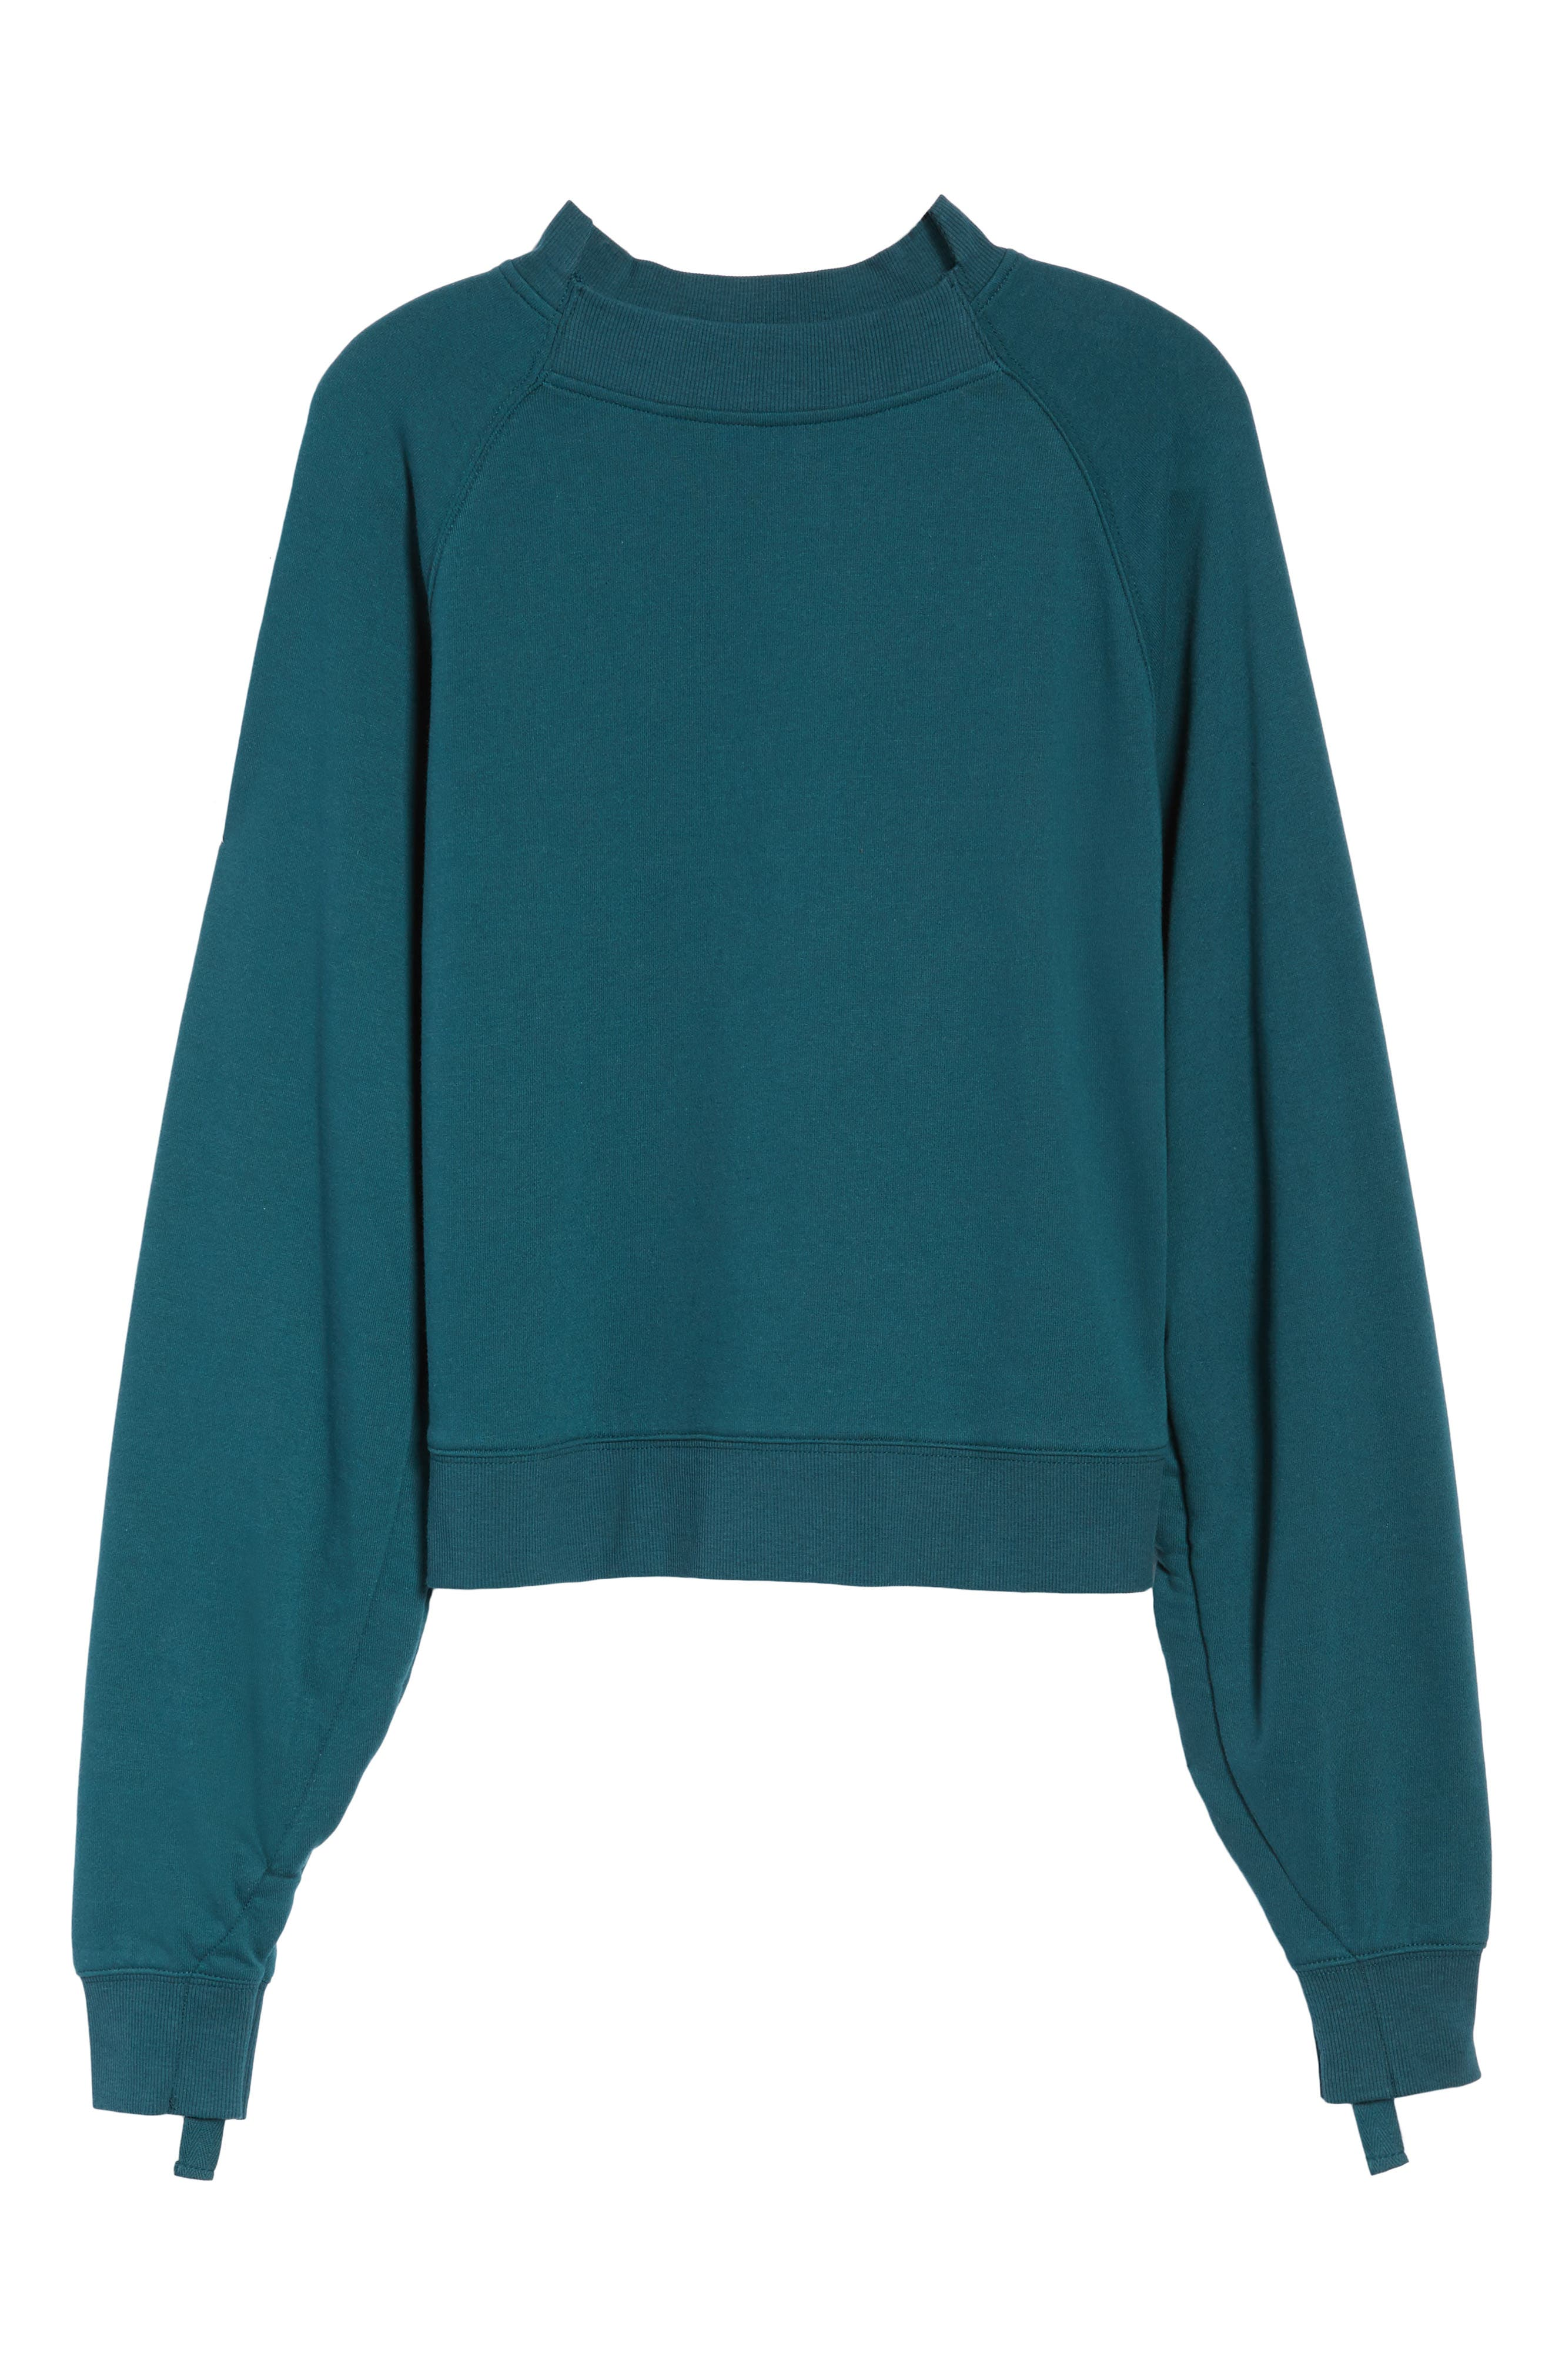 Cinched Sleeve Sweatshirt,                             Alternate thumbnail 6, color,                             440